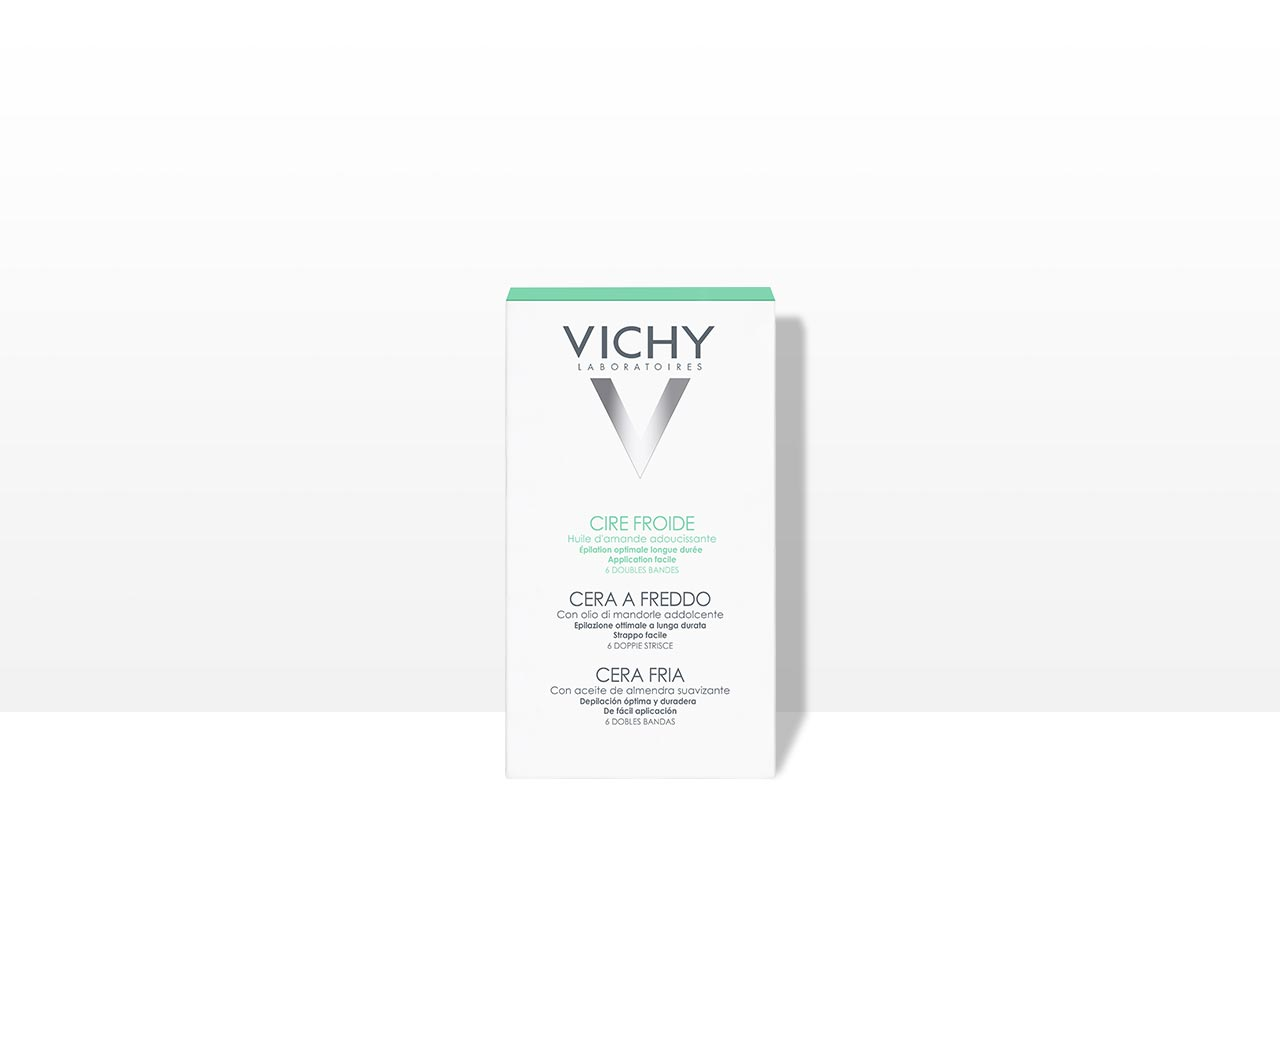 Dépilatoires - Bande de cire froide - Vichy